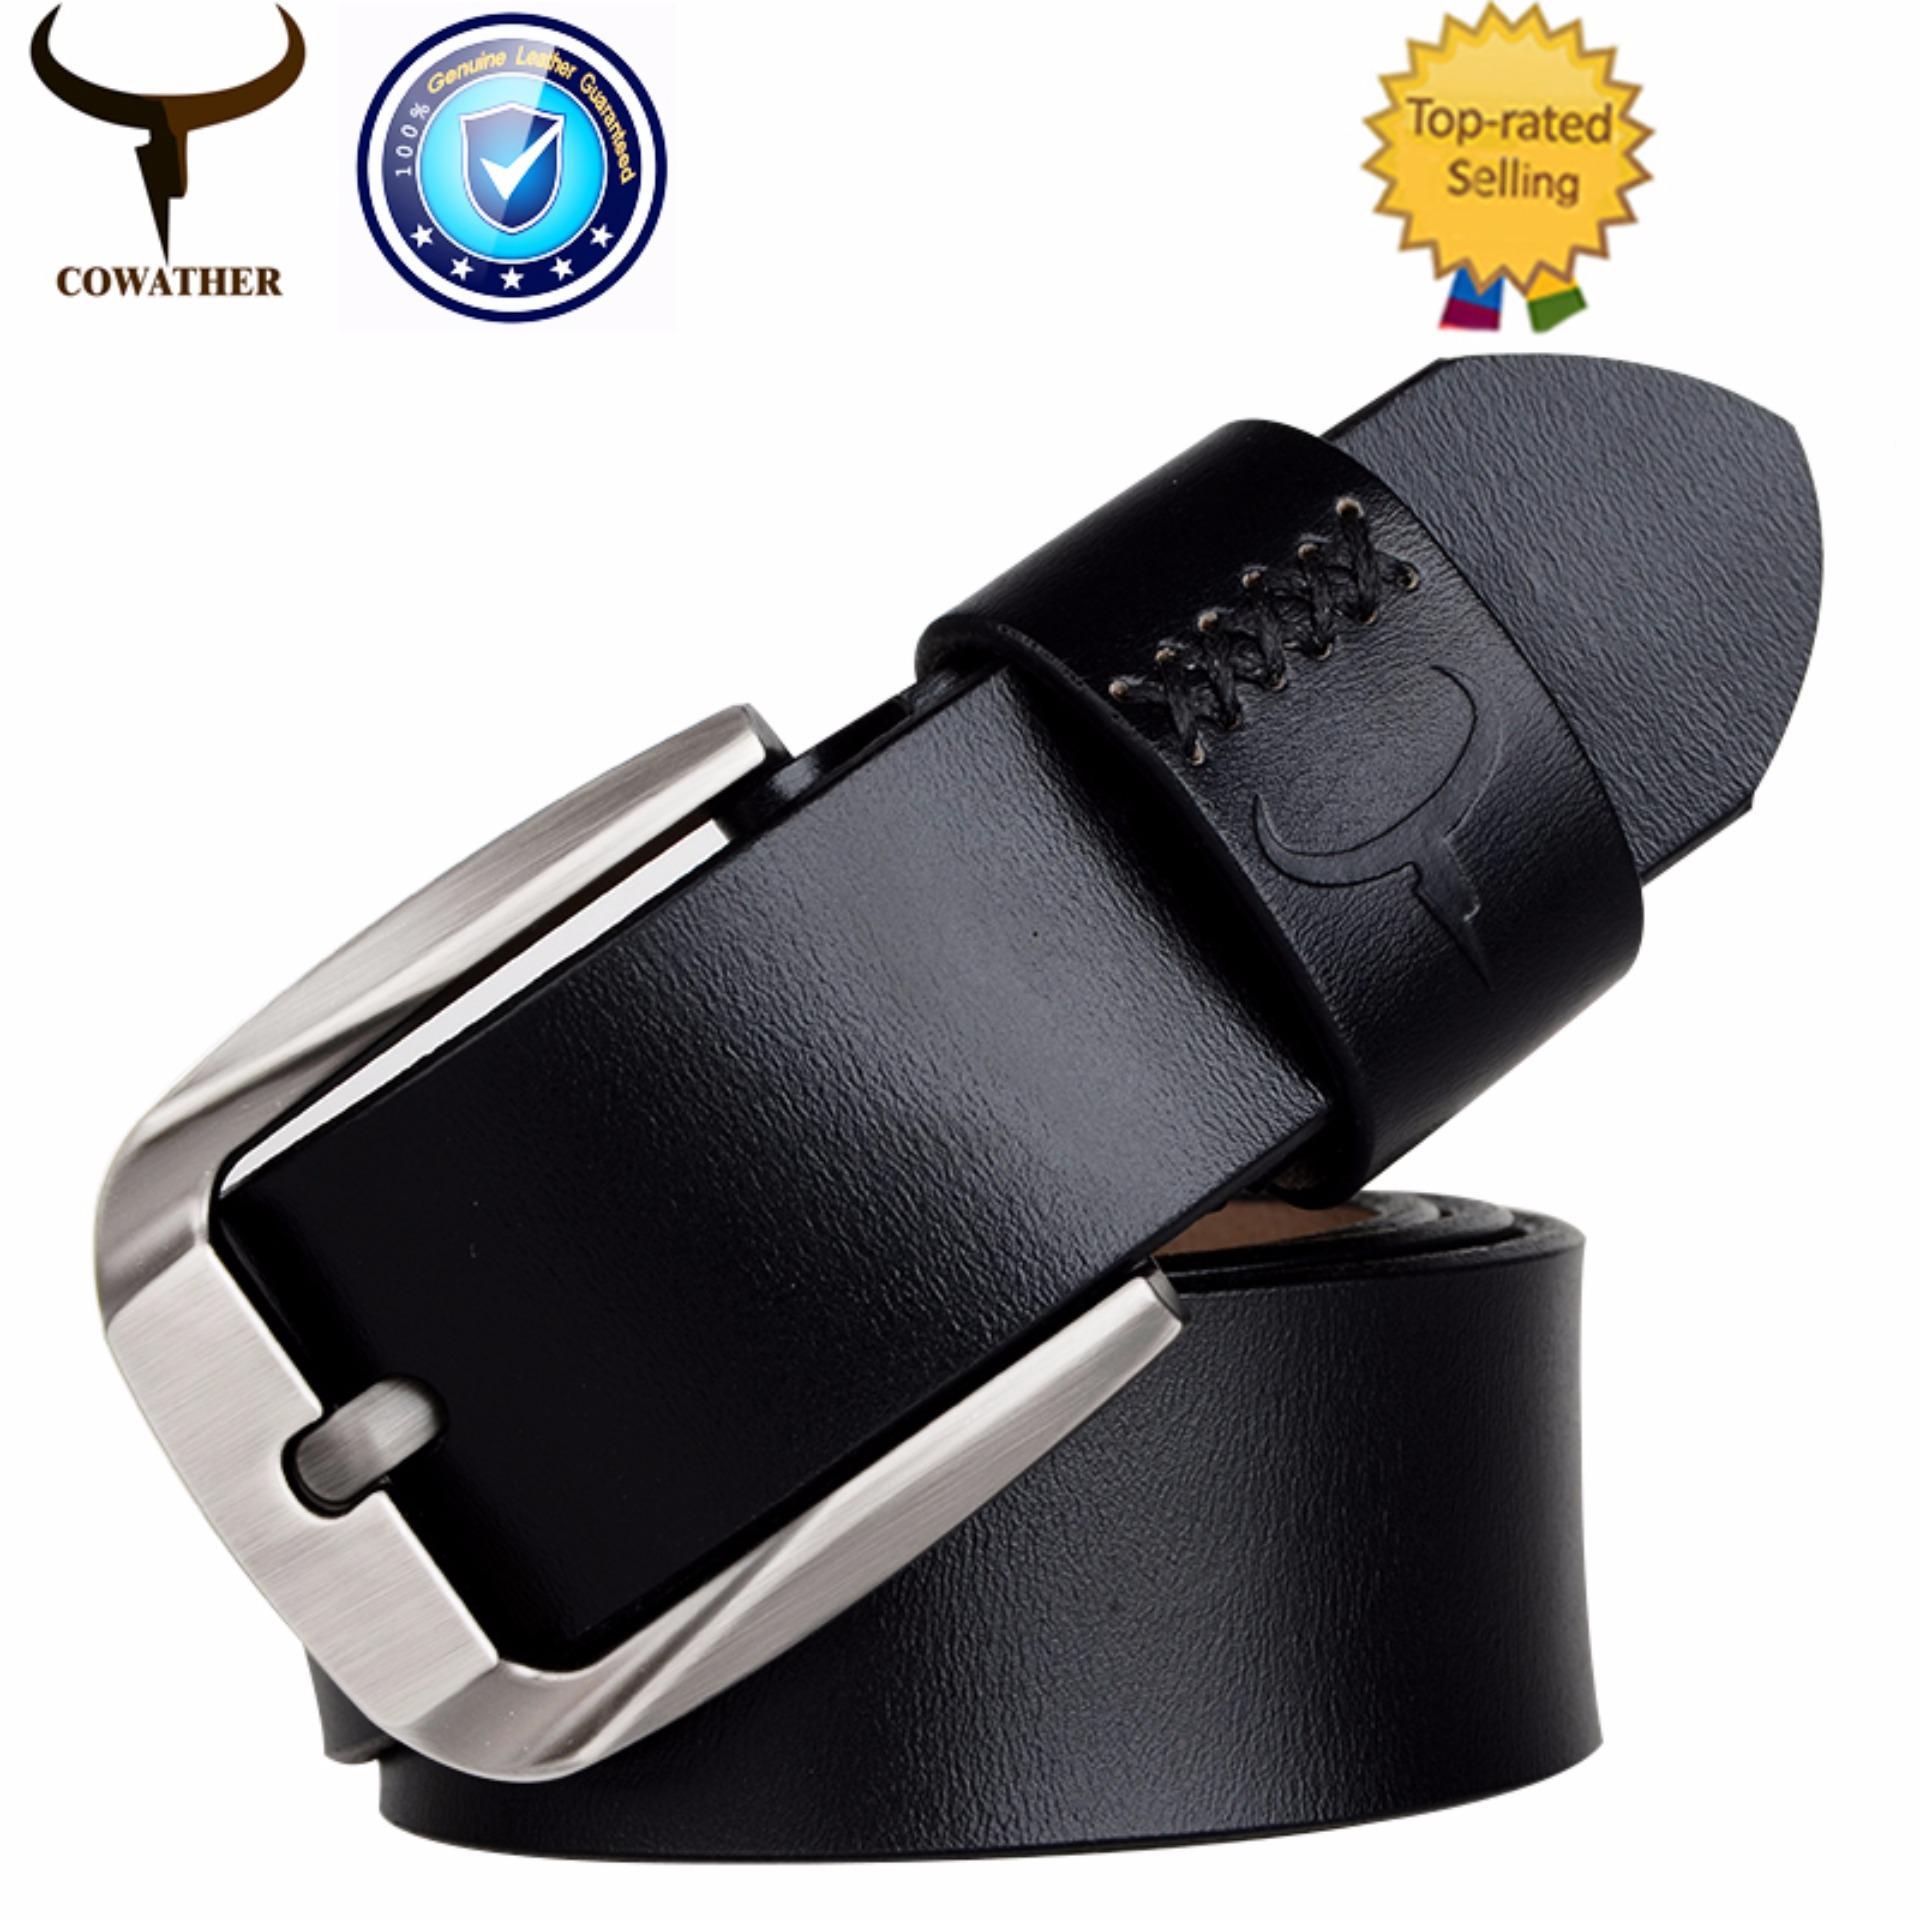 Cowather Kulit Asli Pria Ratchet Dress Belt Kulit Halus Reversible Bulu Edge Belt Original